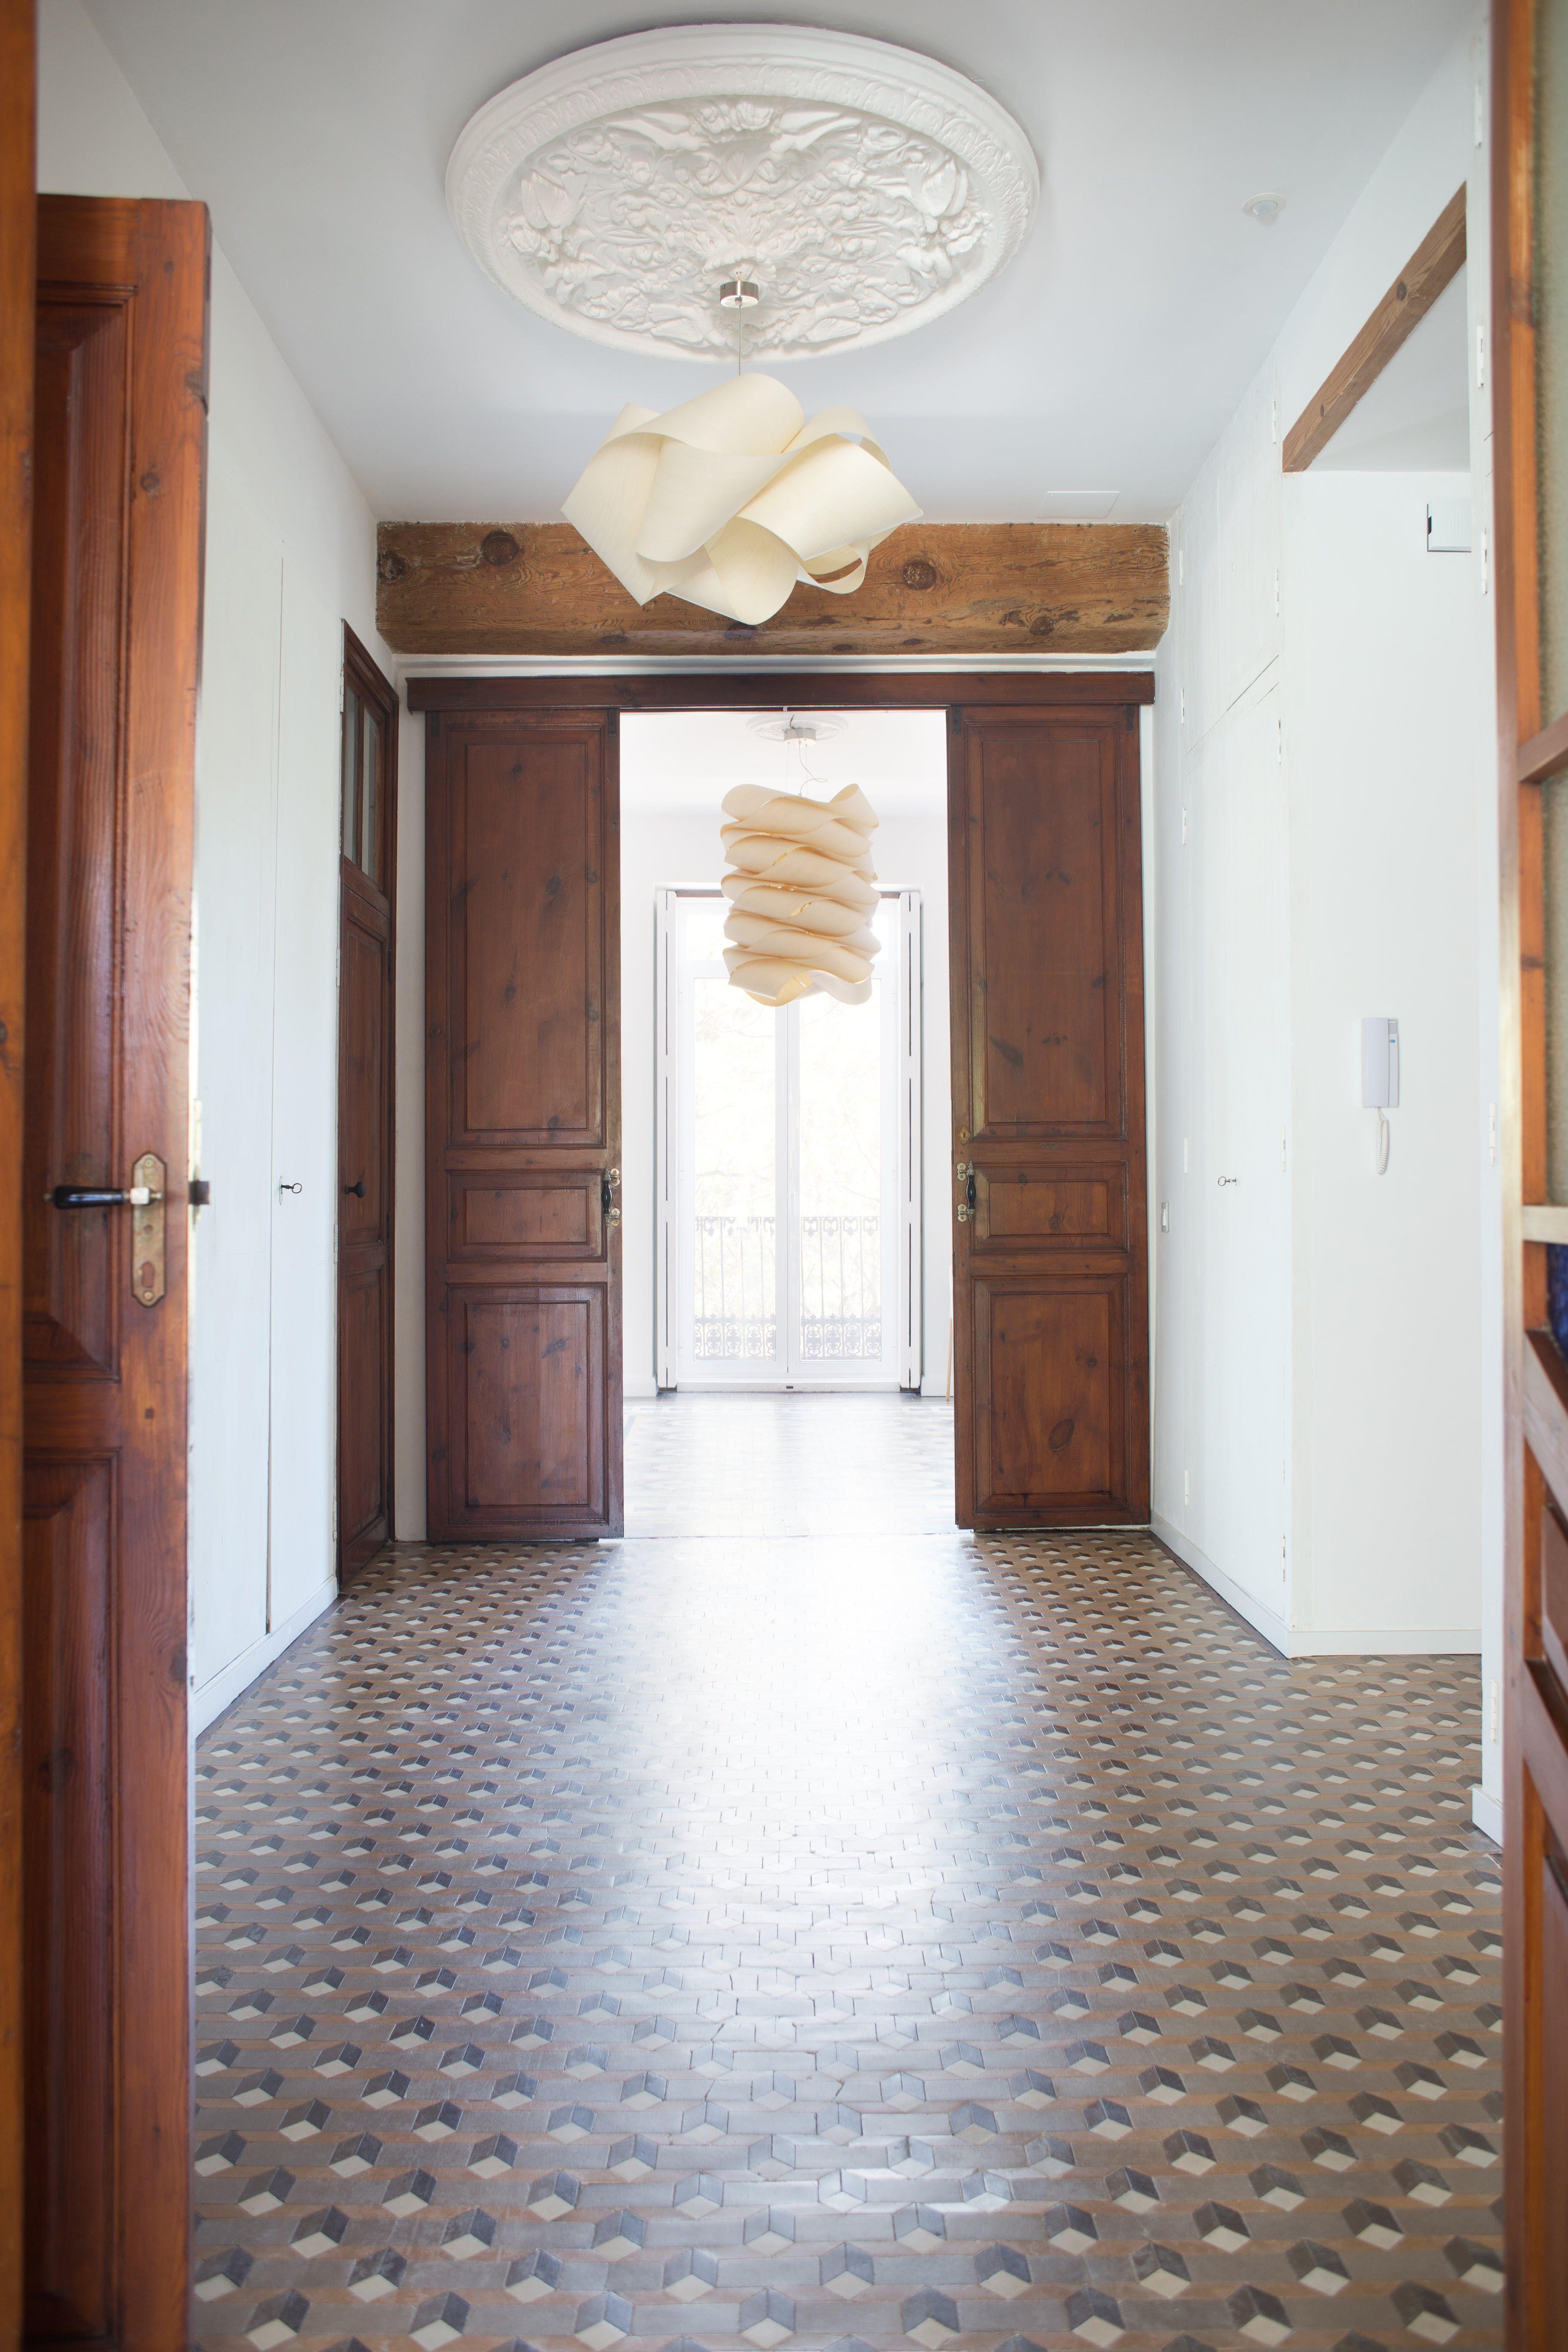 A Minimal & Modern Renovated Spanish Home | Valencia spain, Tile ...